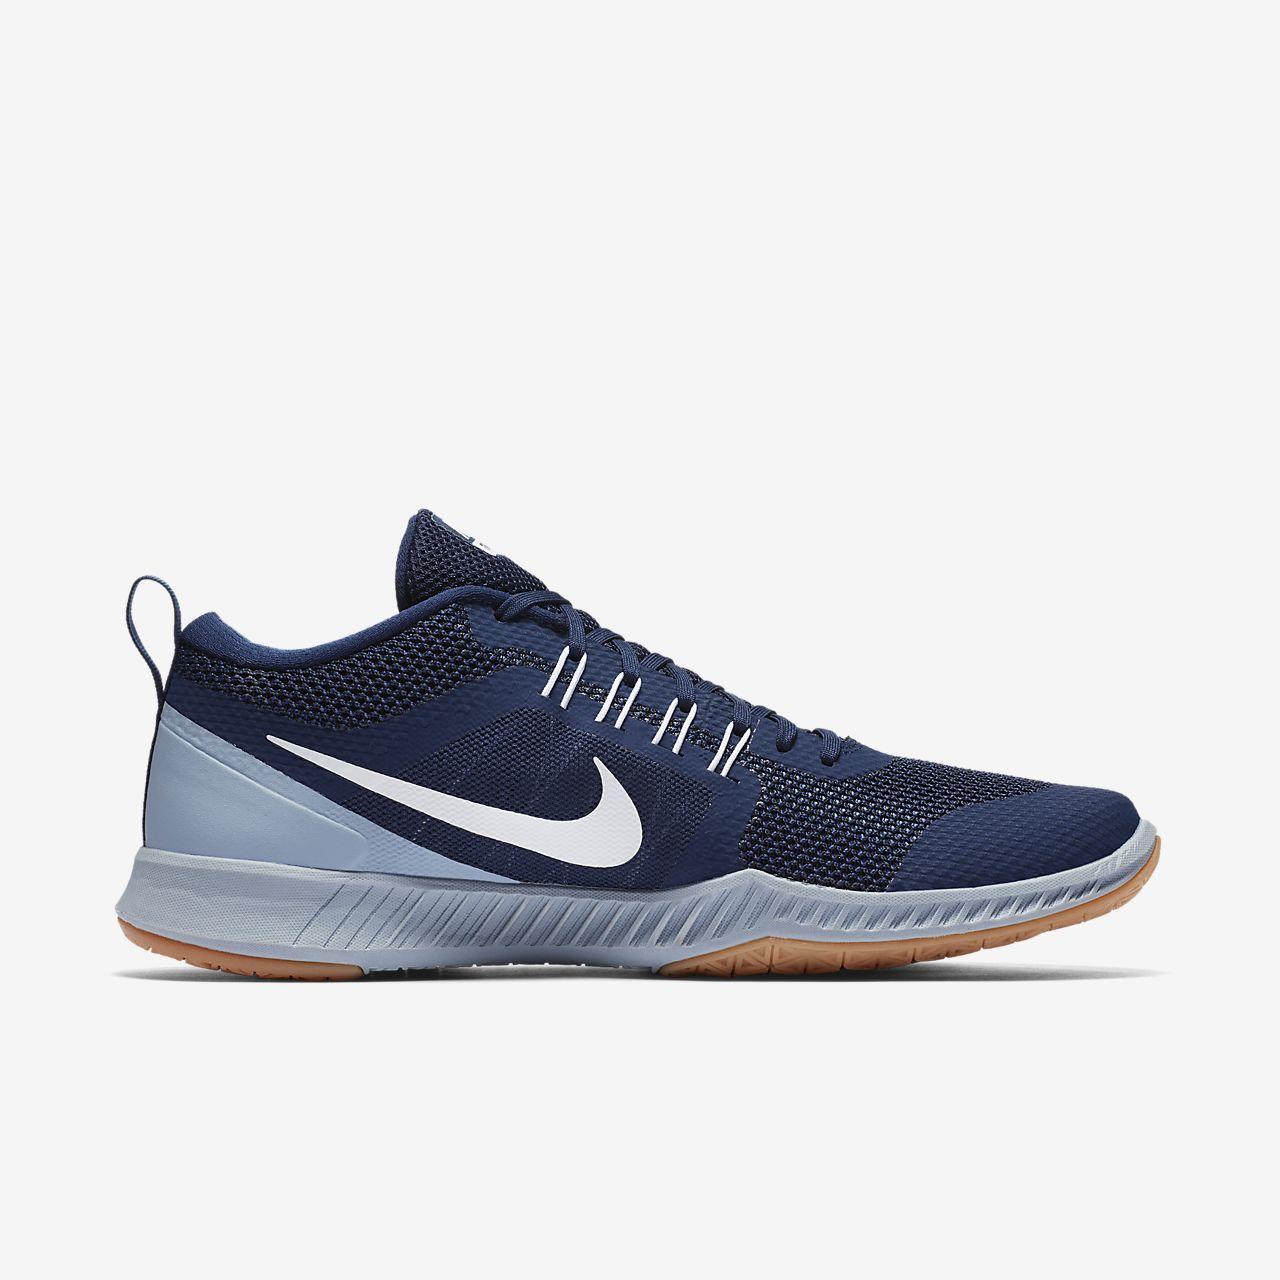 uk availability 7499e 48f69 Chaussure de training pour Homme. Nike Zoom Domination